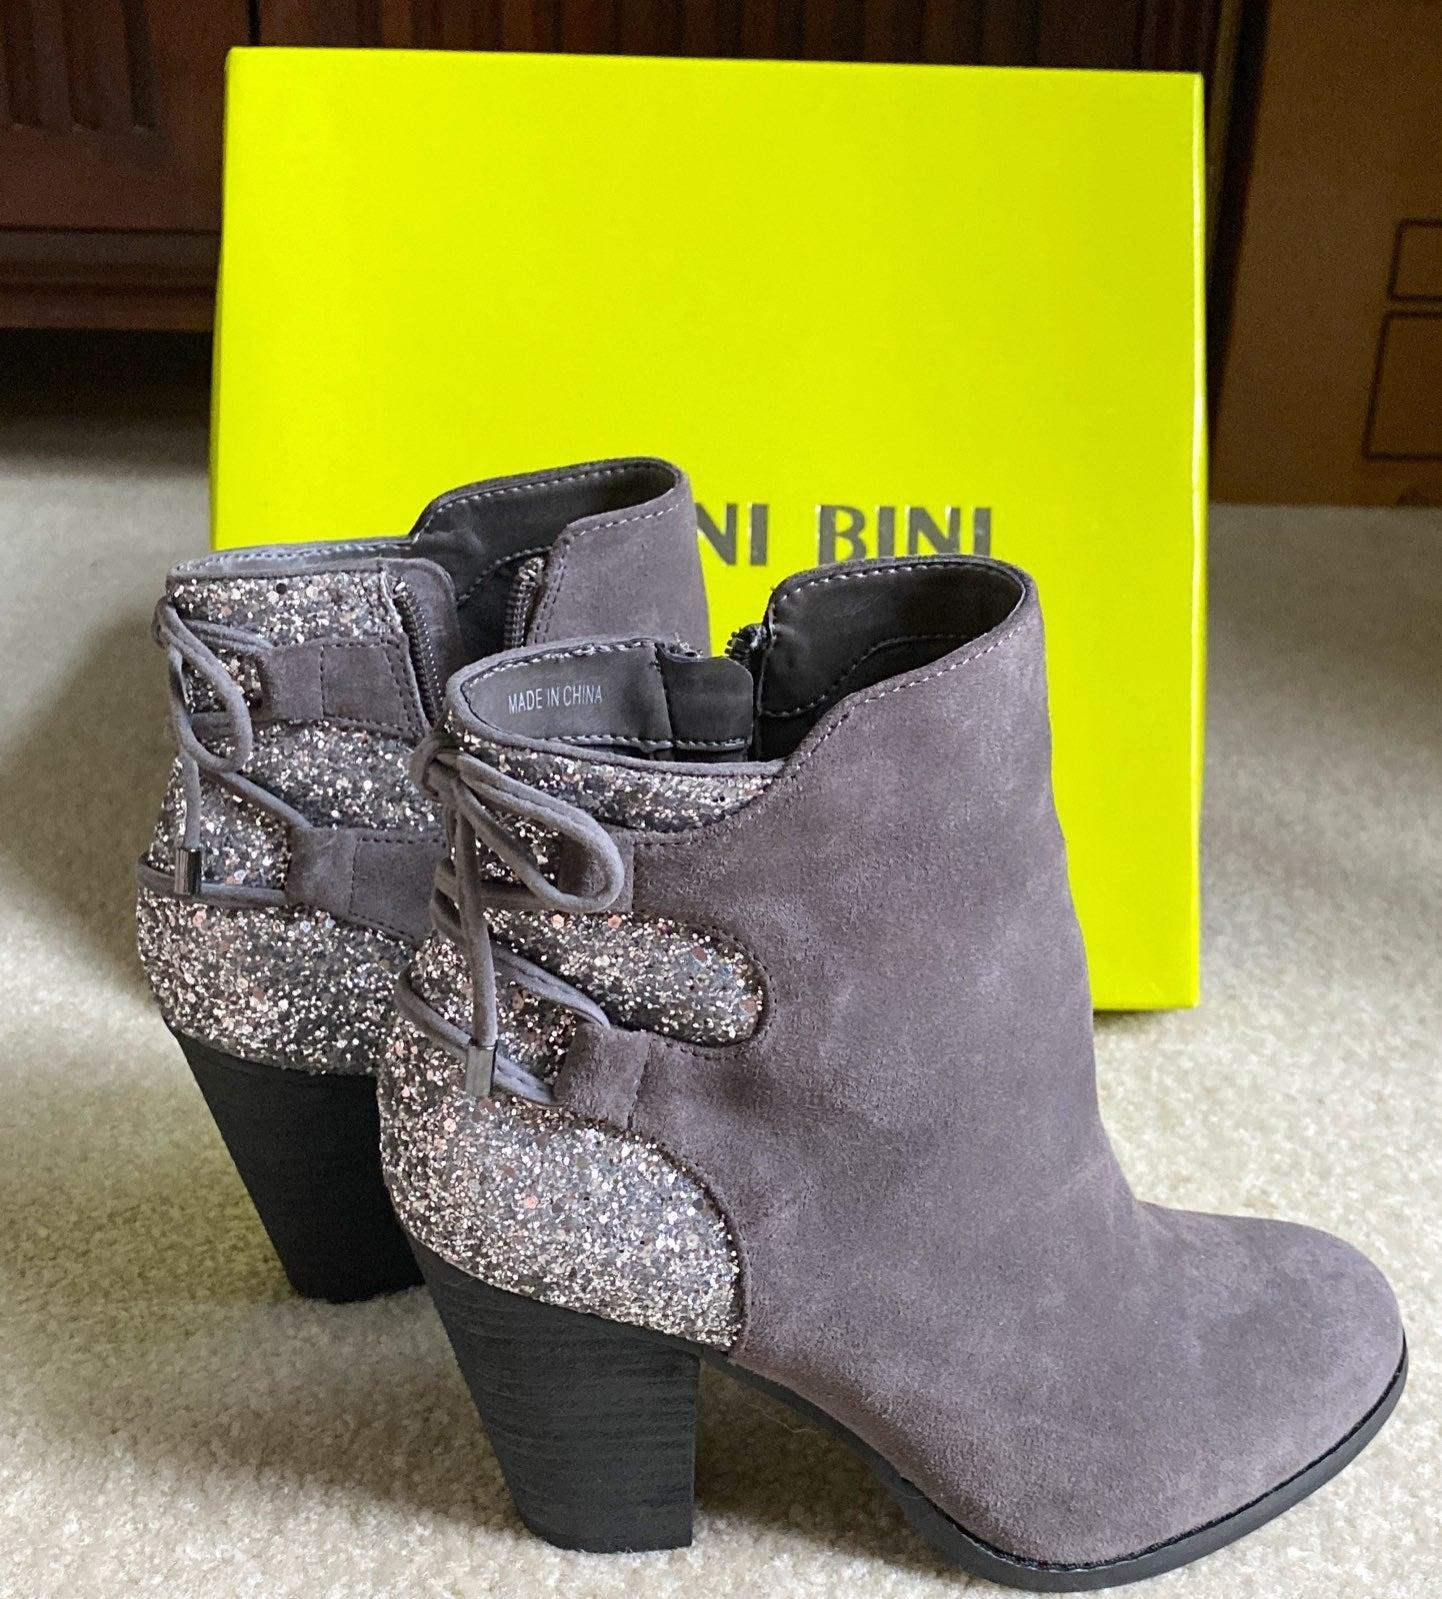 New! Gianni Bini booties